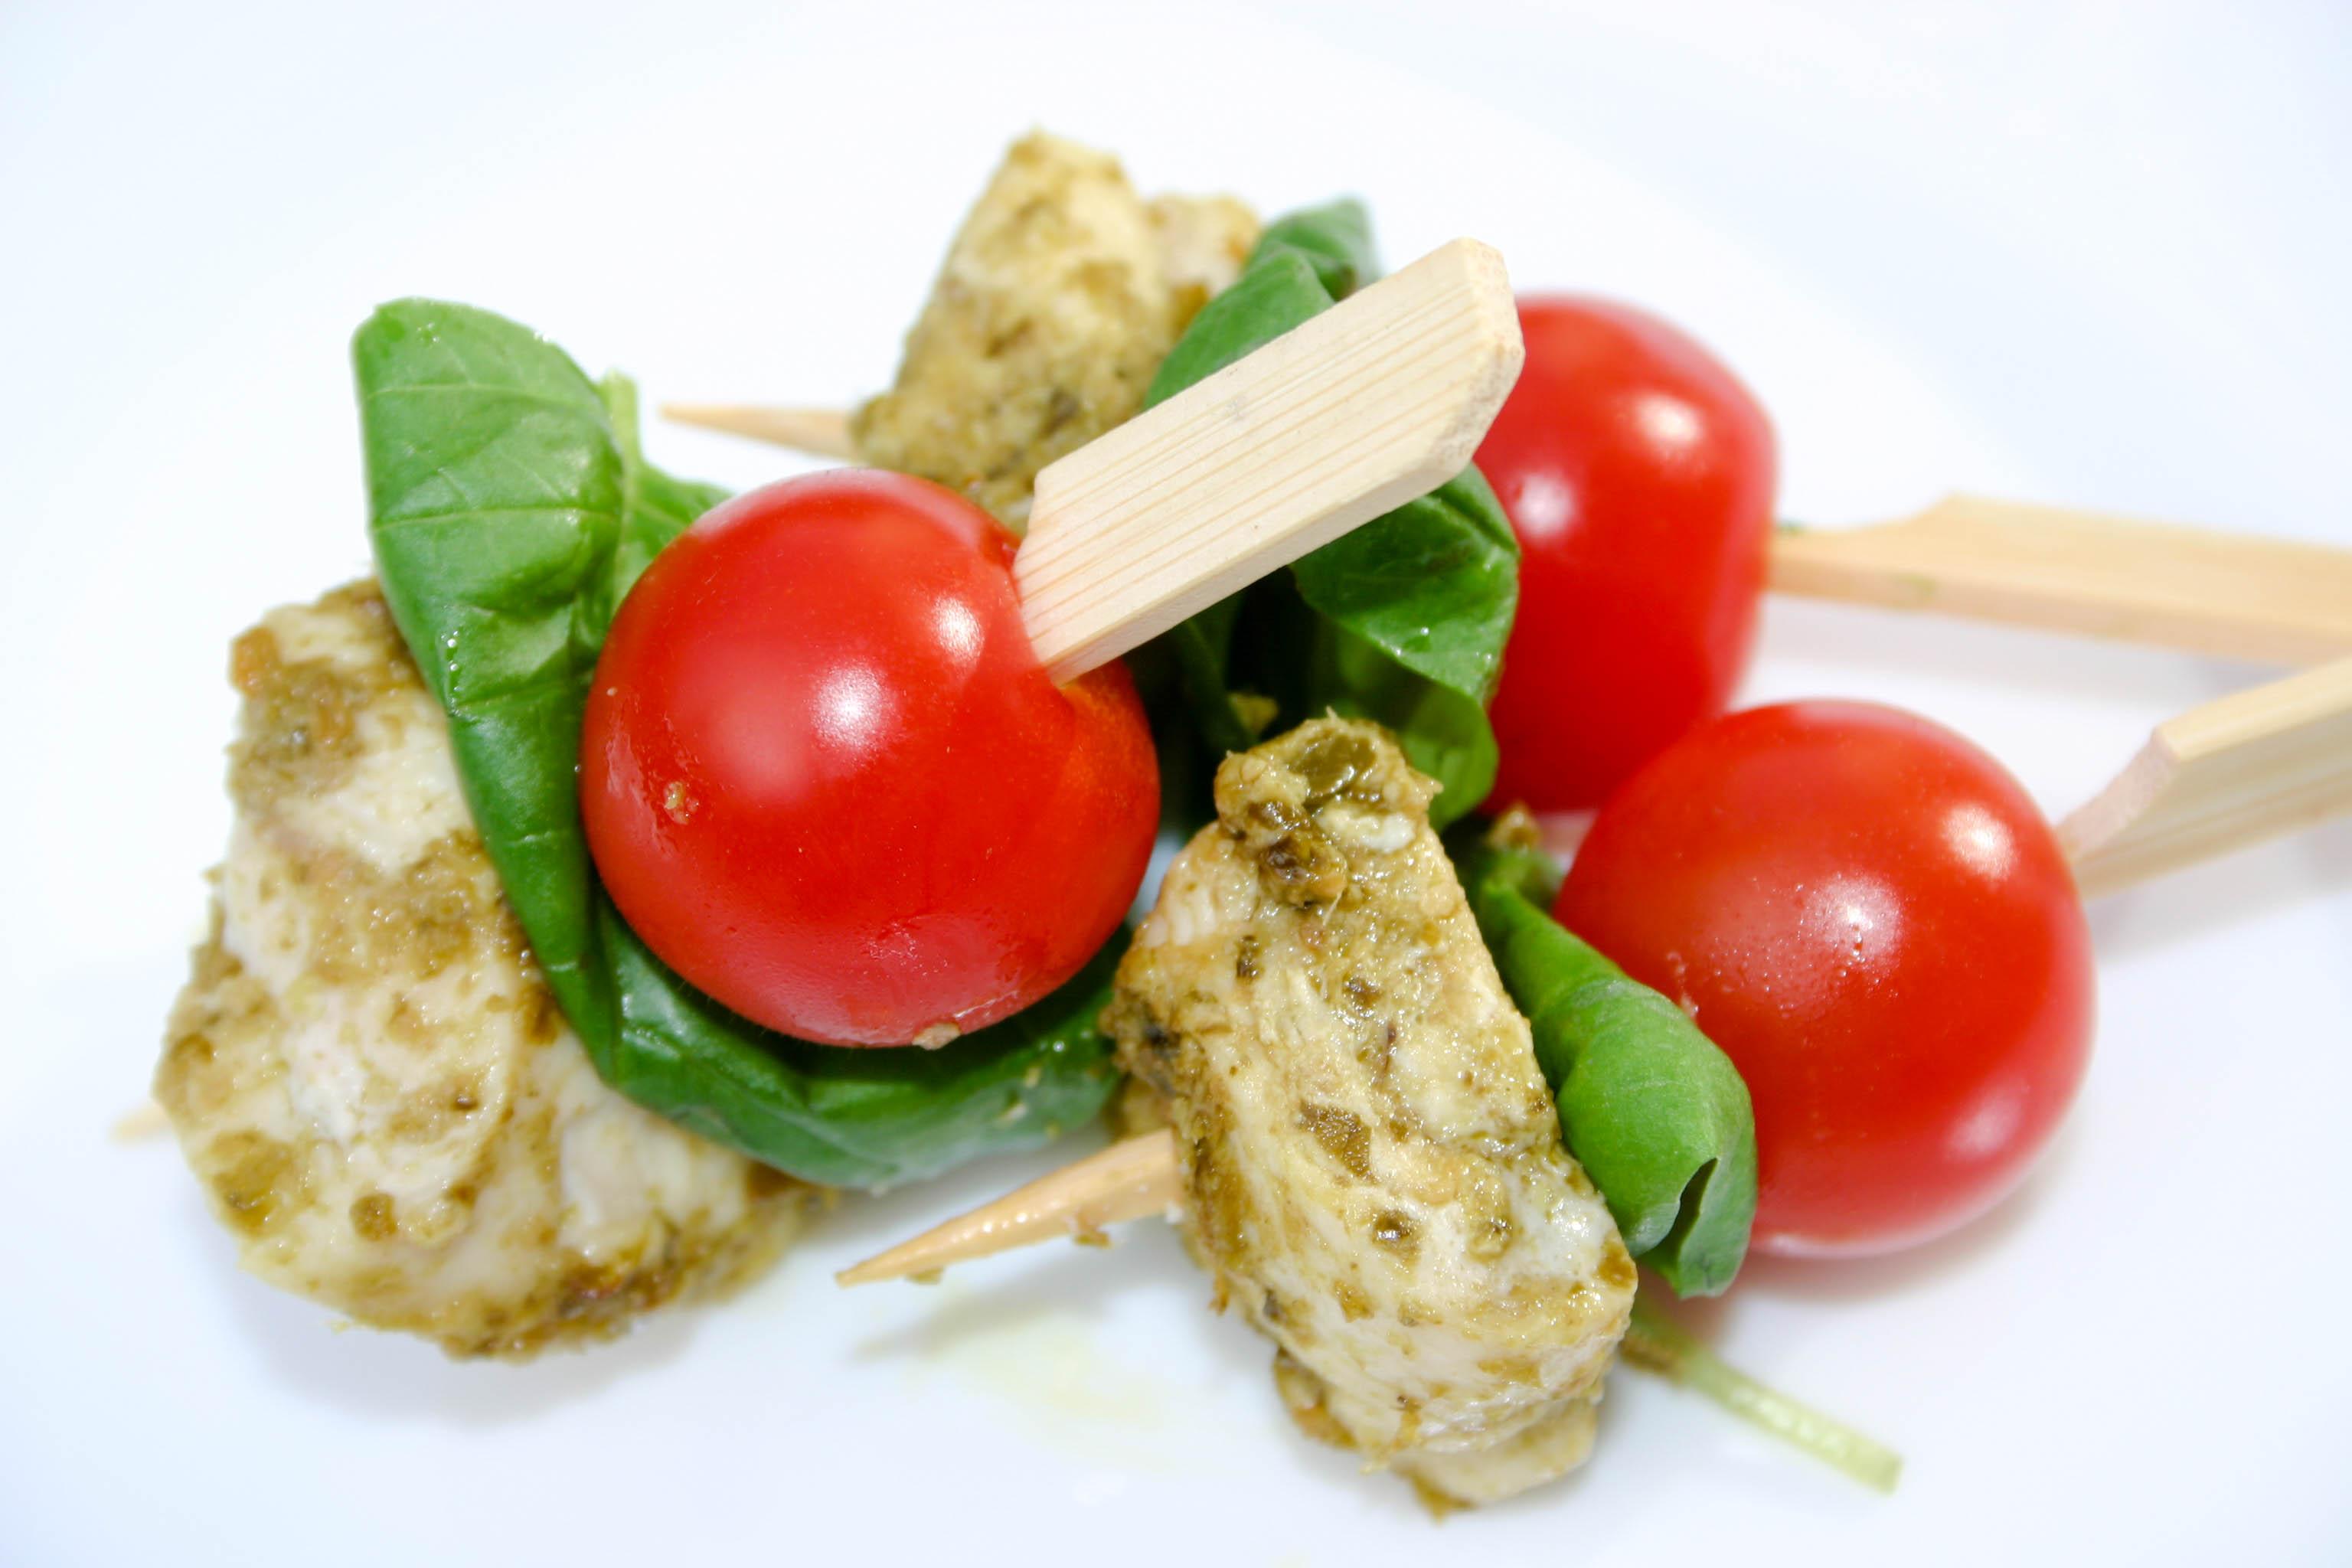 Pesto chicken, tomato & basil skewer